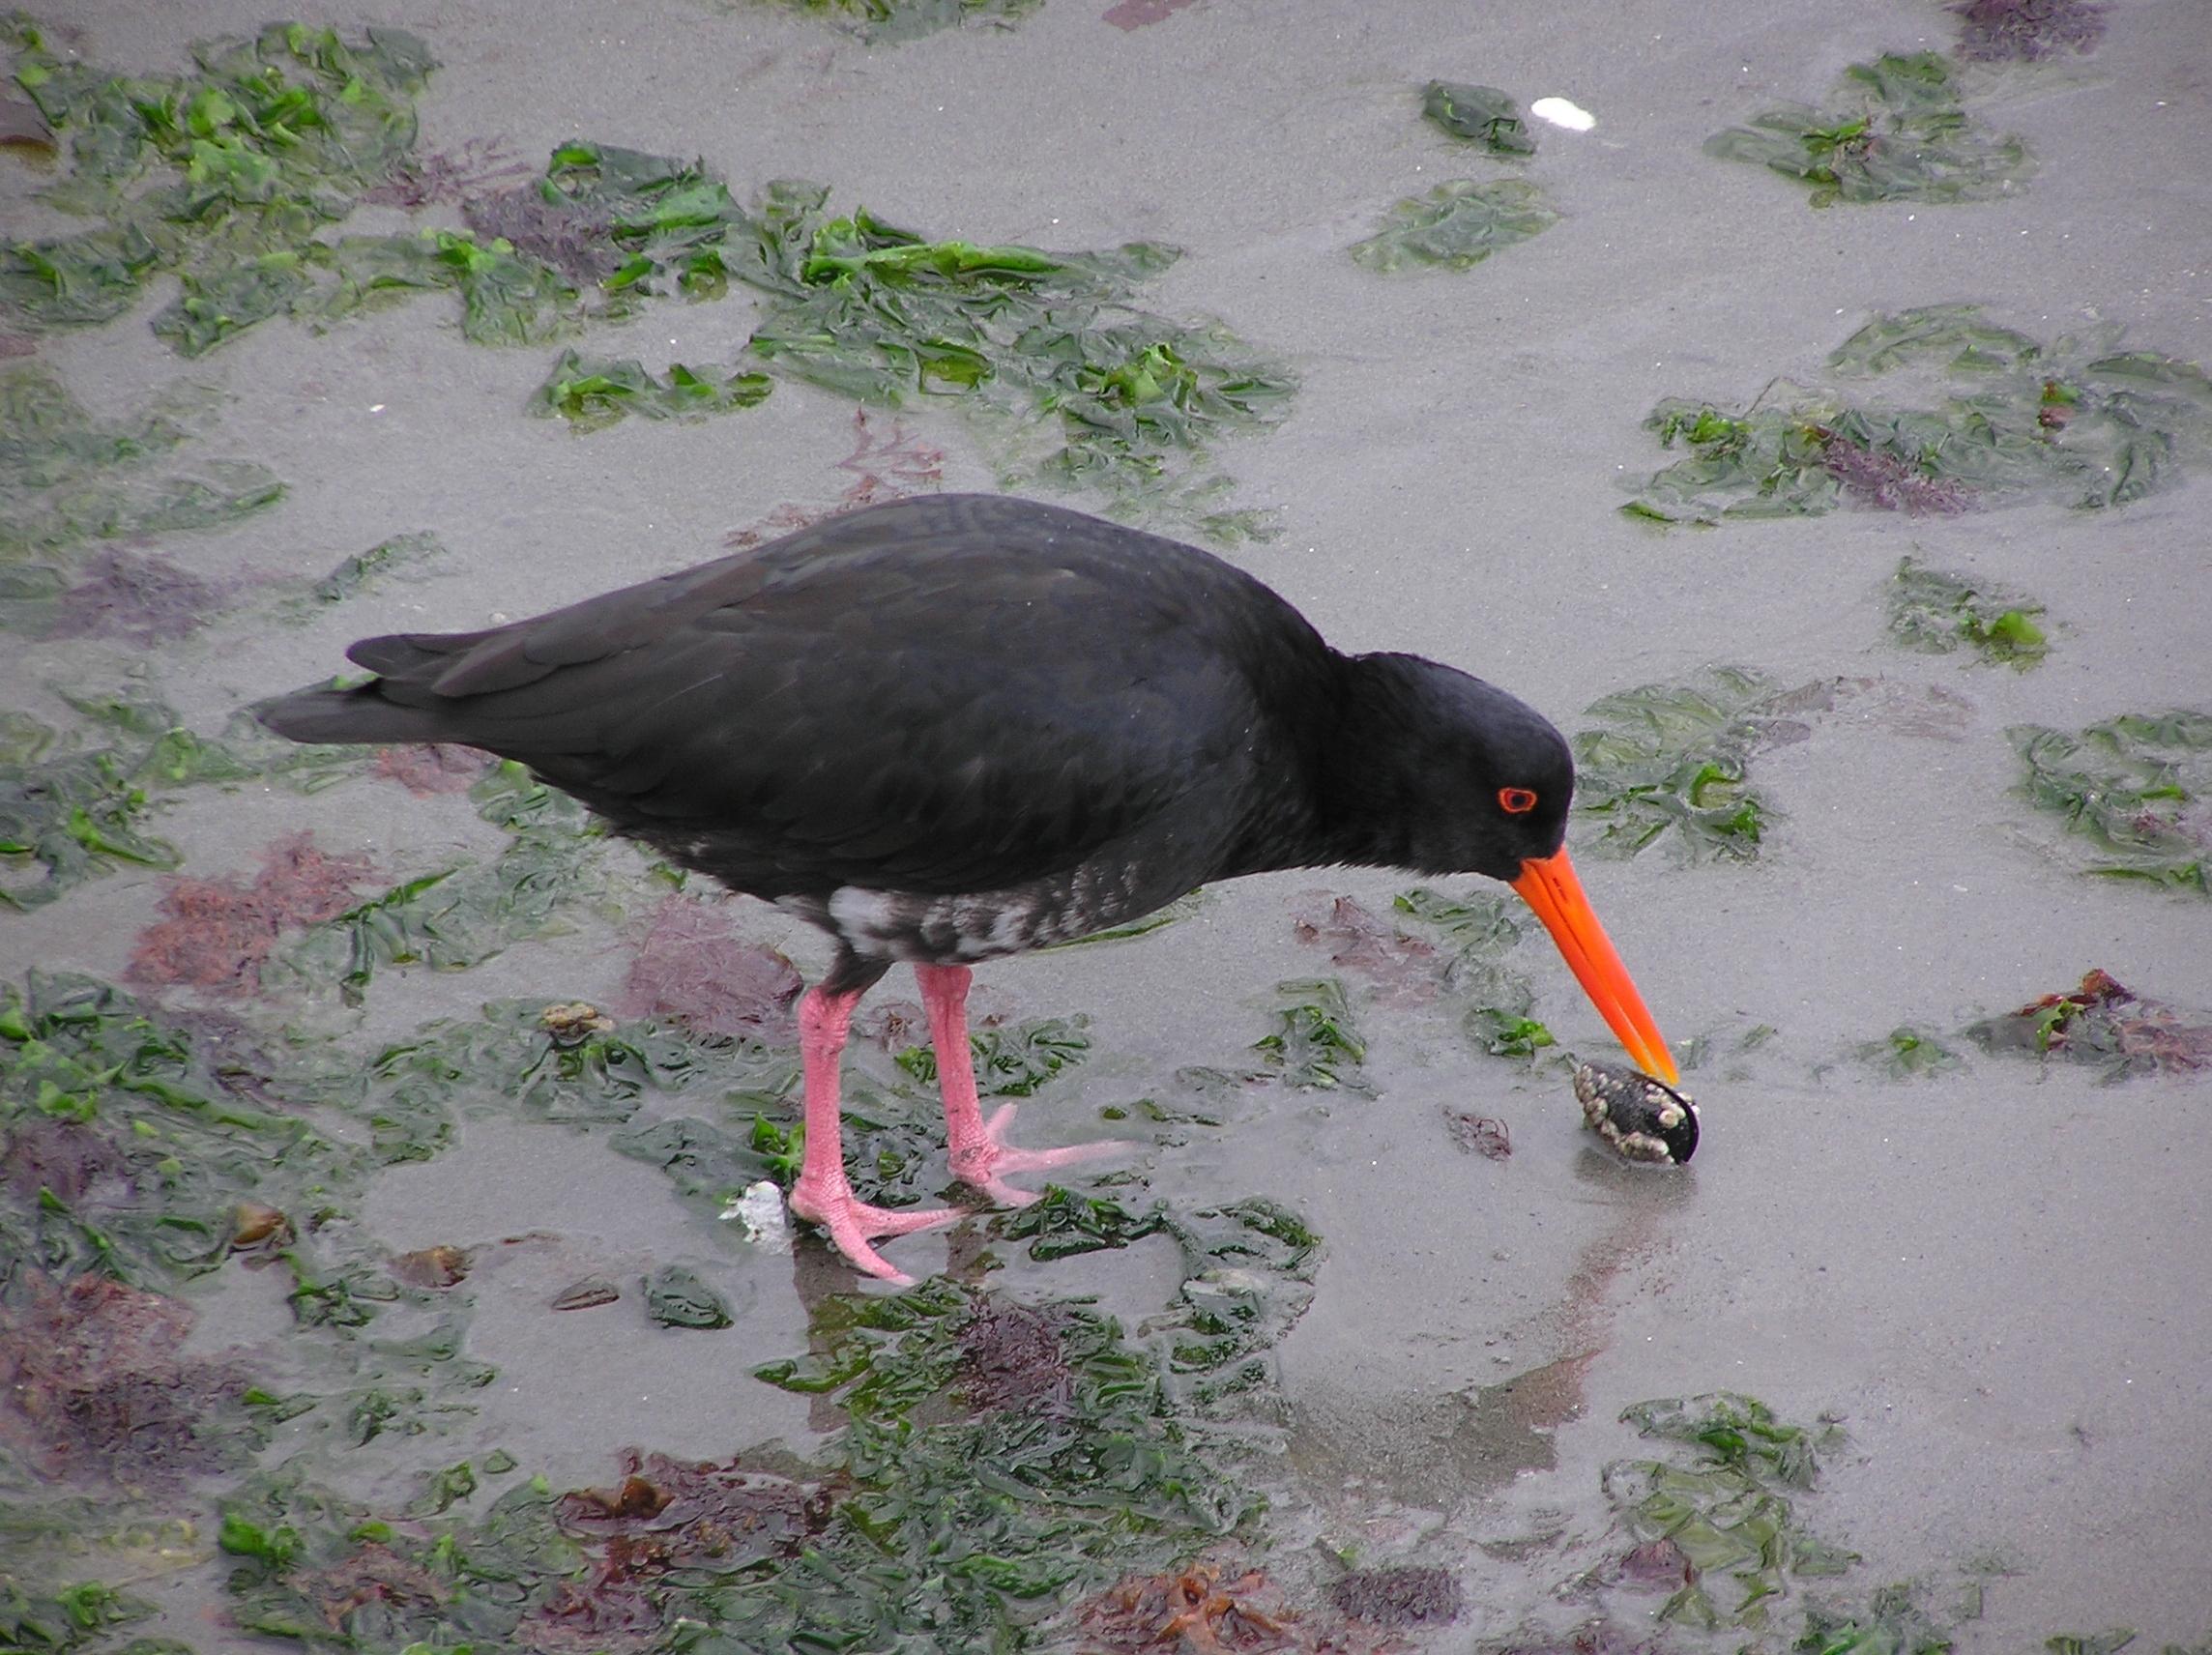 neuseeland vögel kreuzworträtsel